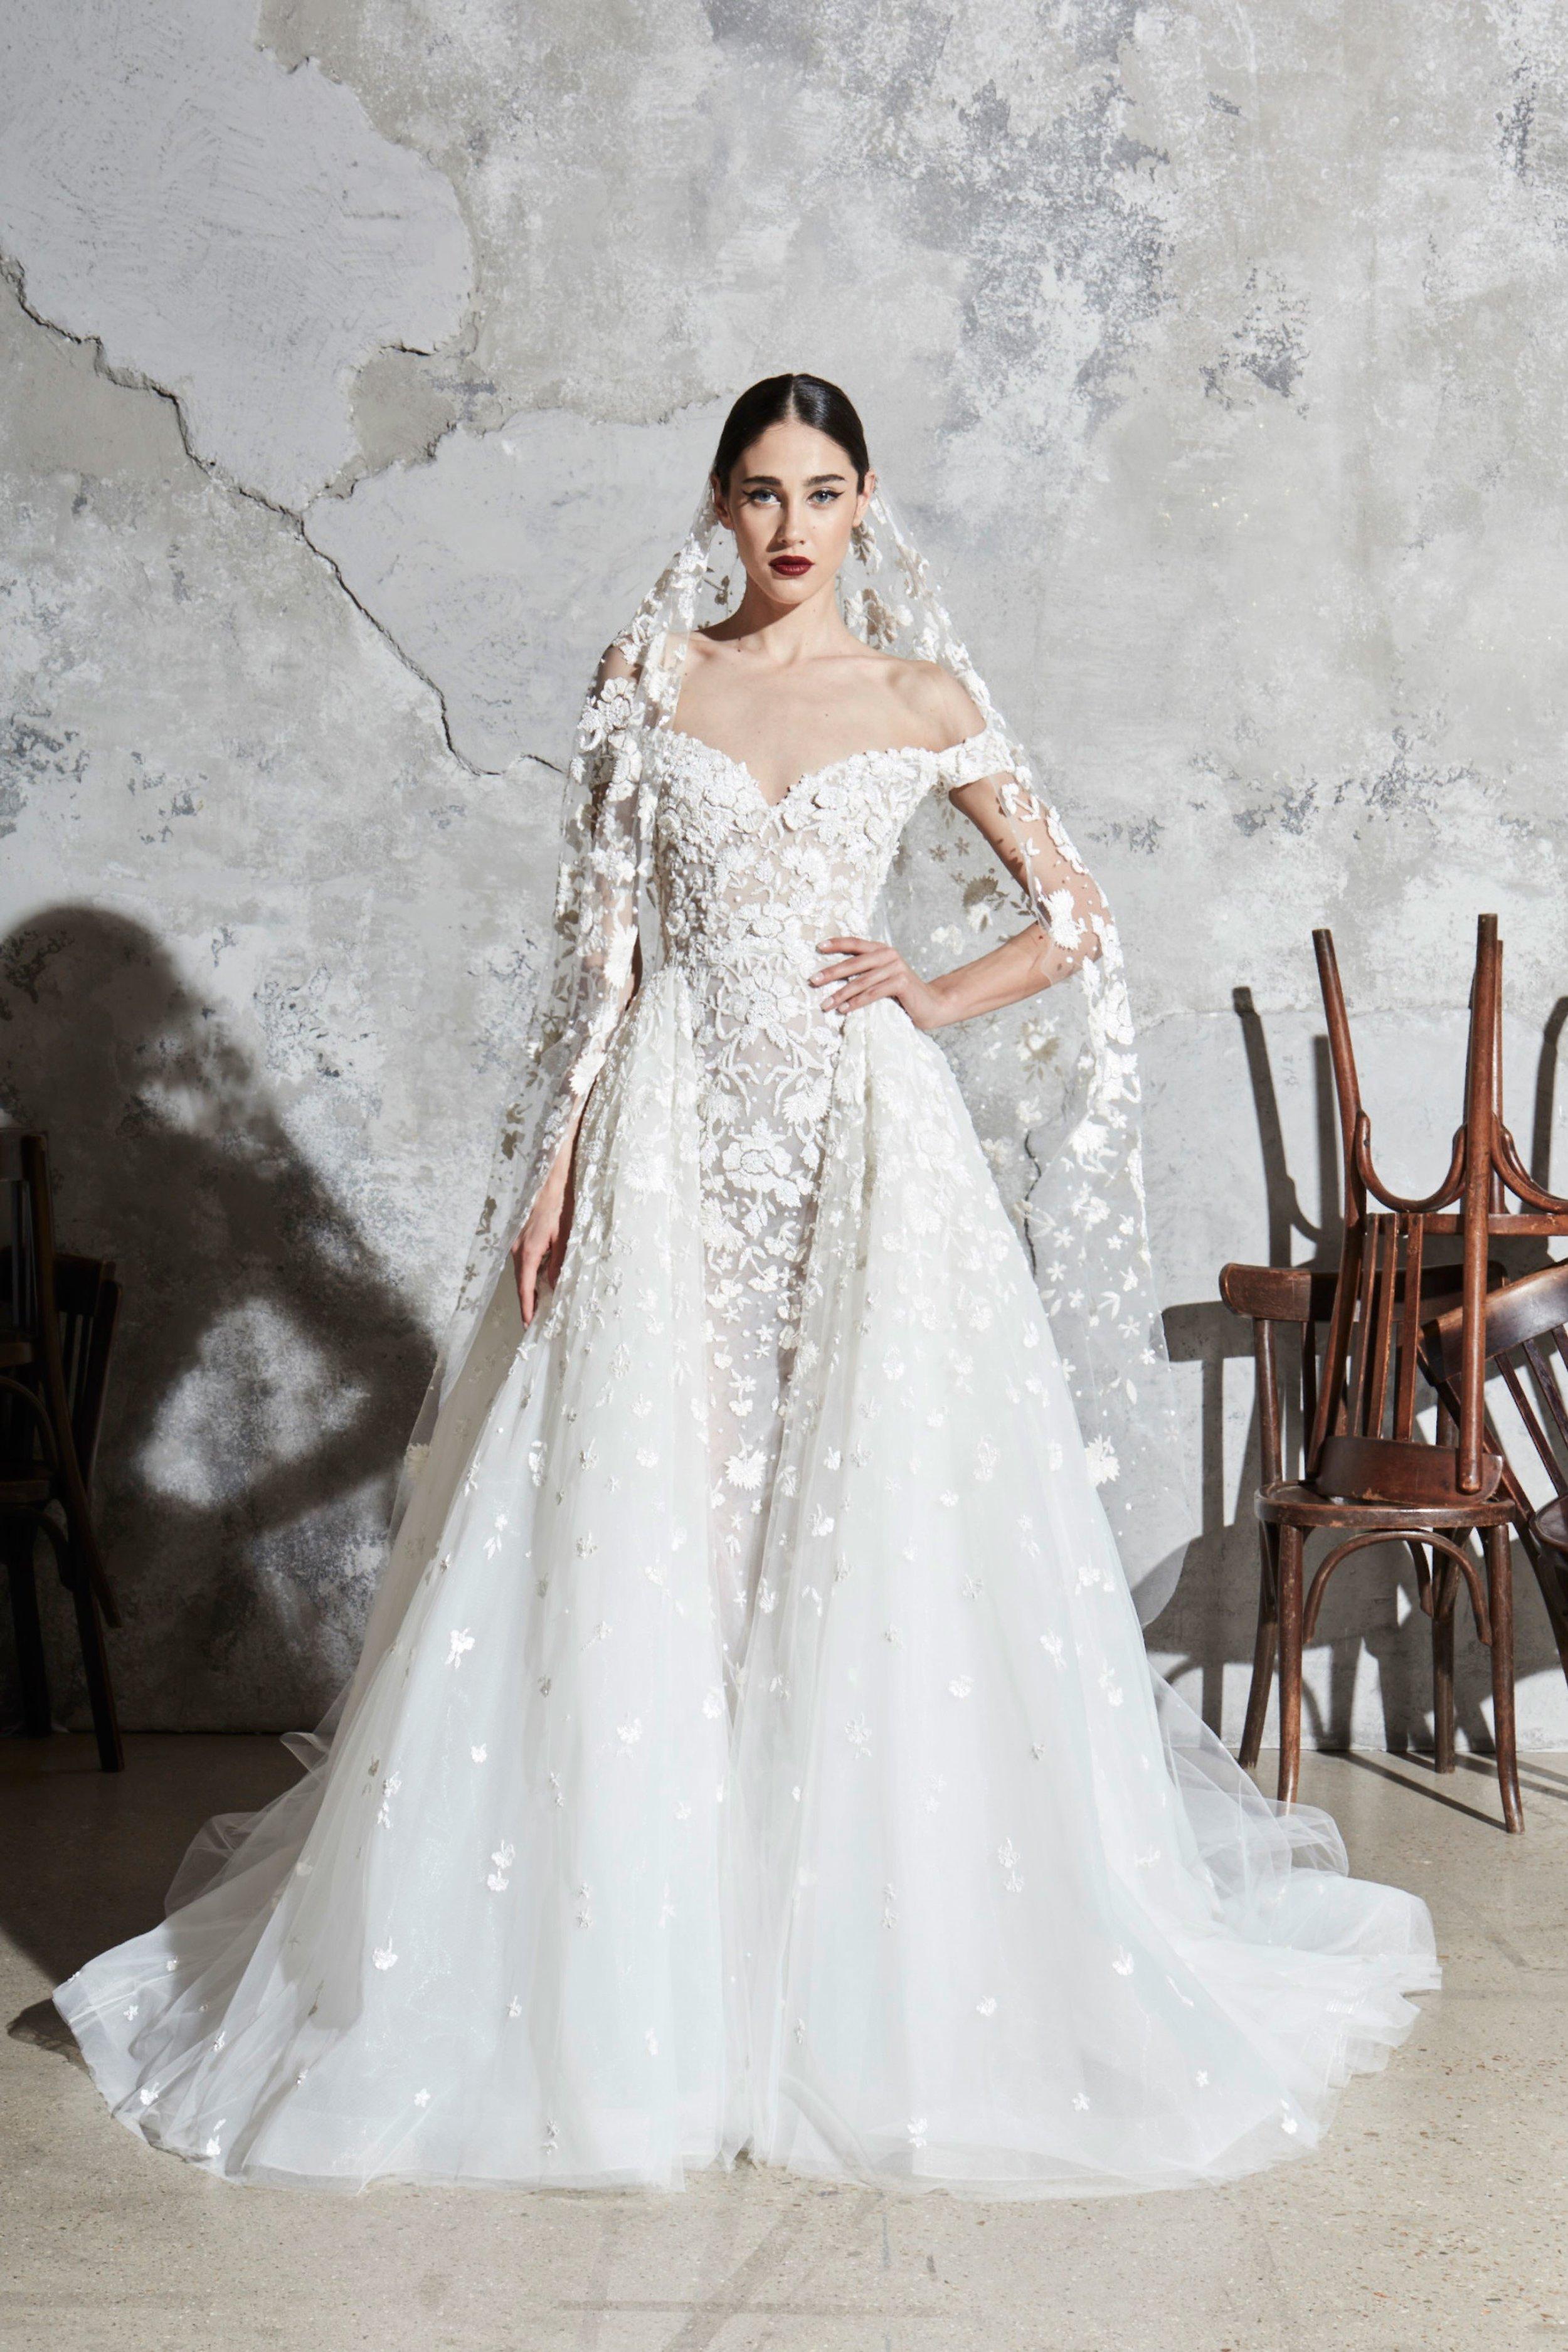 00023-zuhair-murad-new-york-bridal-Spring-2020-CREDIT-Thomas-Nutzl.jpg